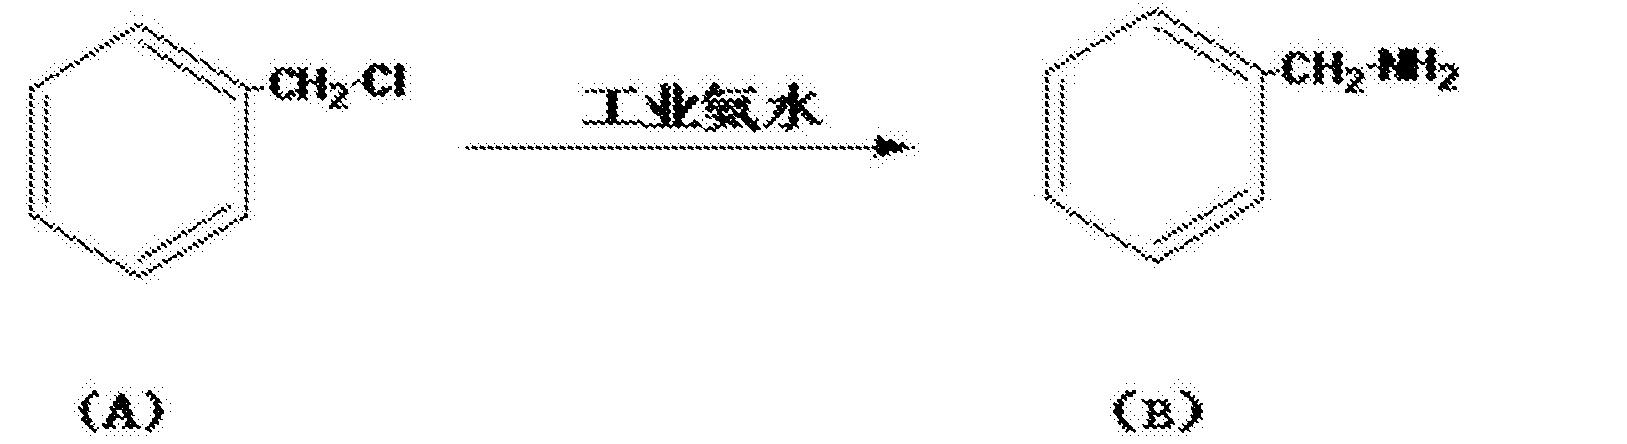 Figure CN106187863AD00222